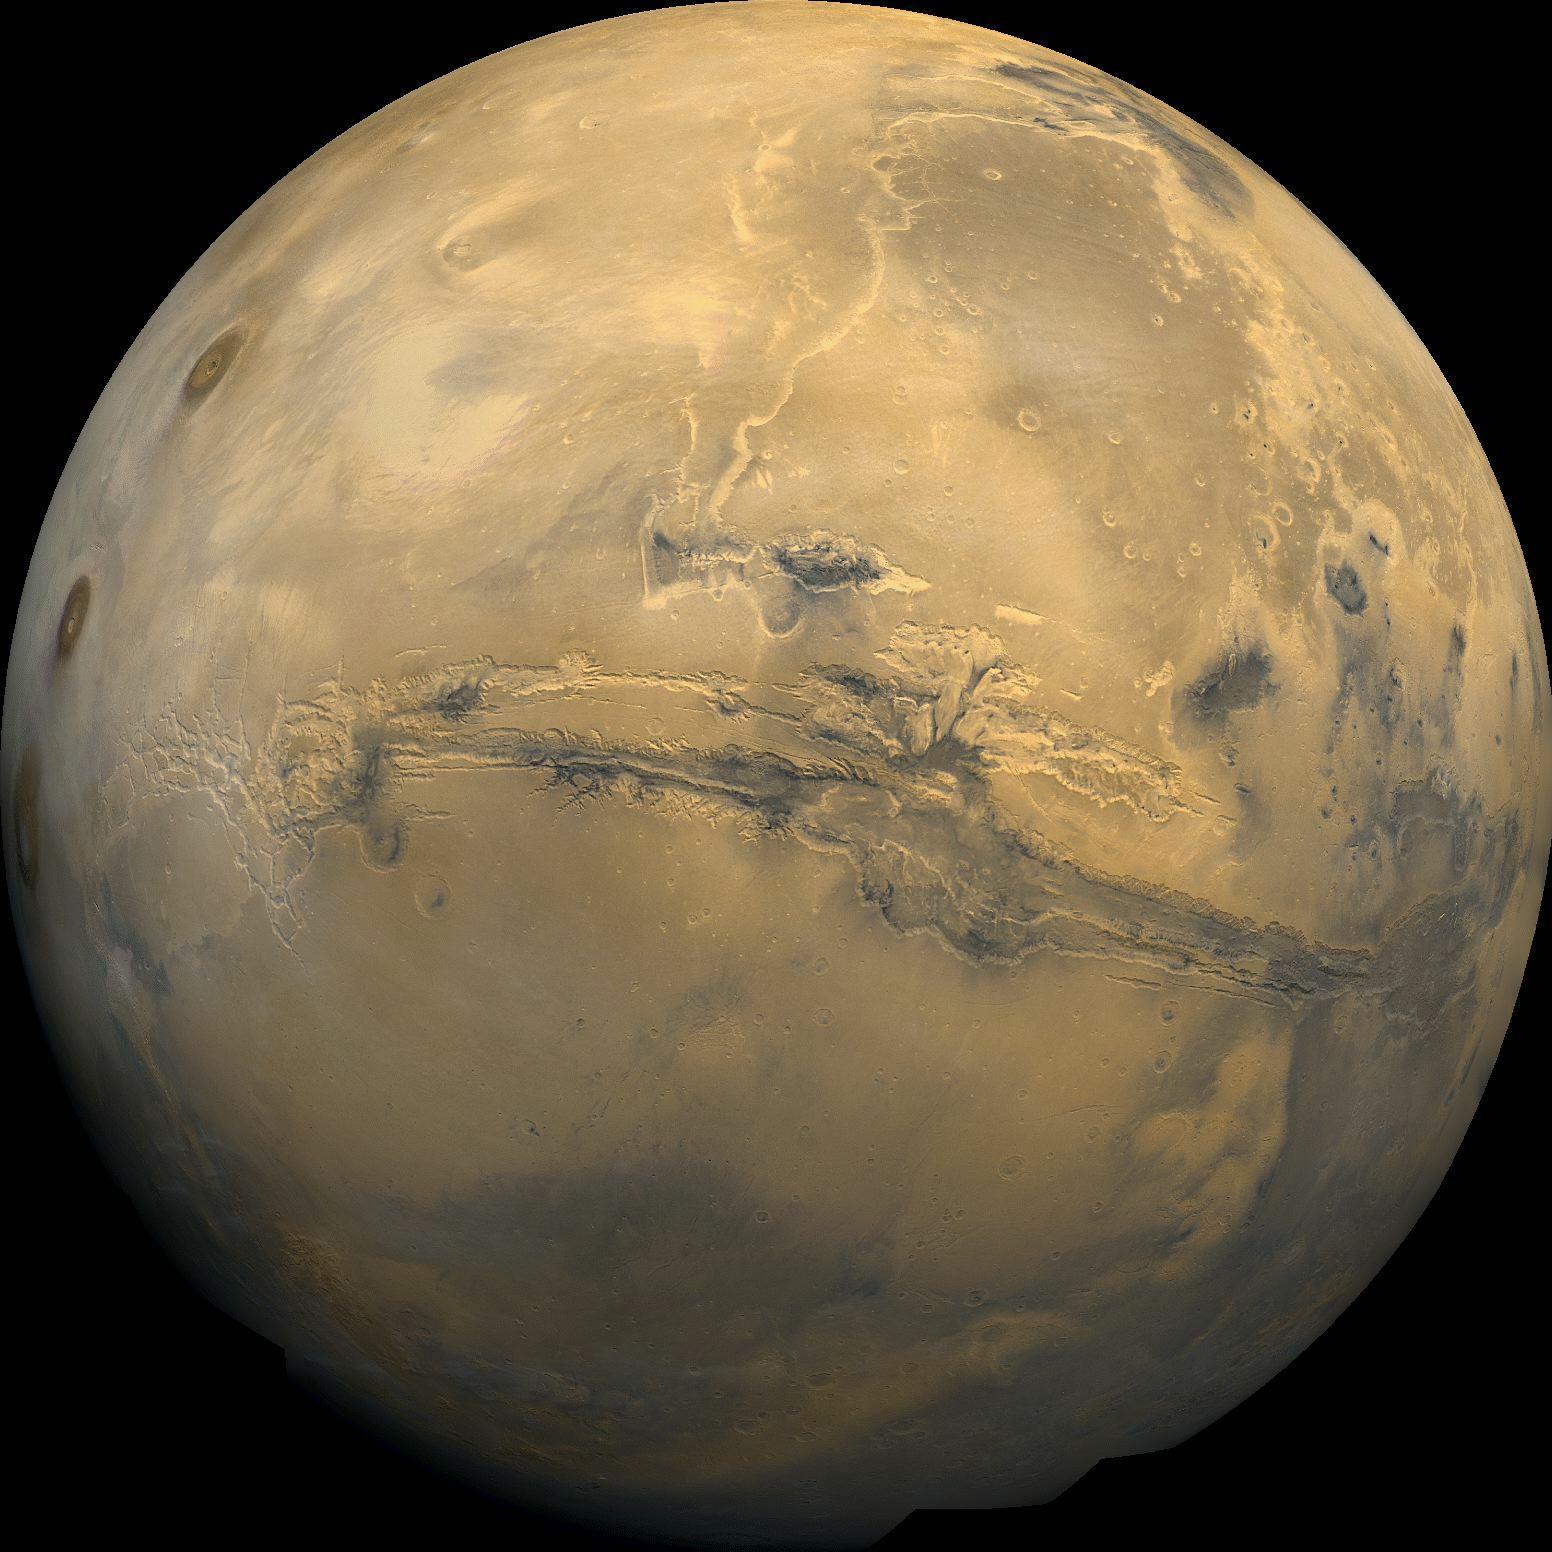 mars one 2033 - photo #27